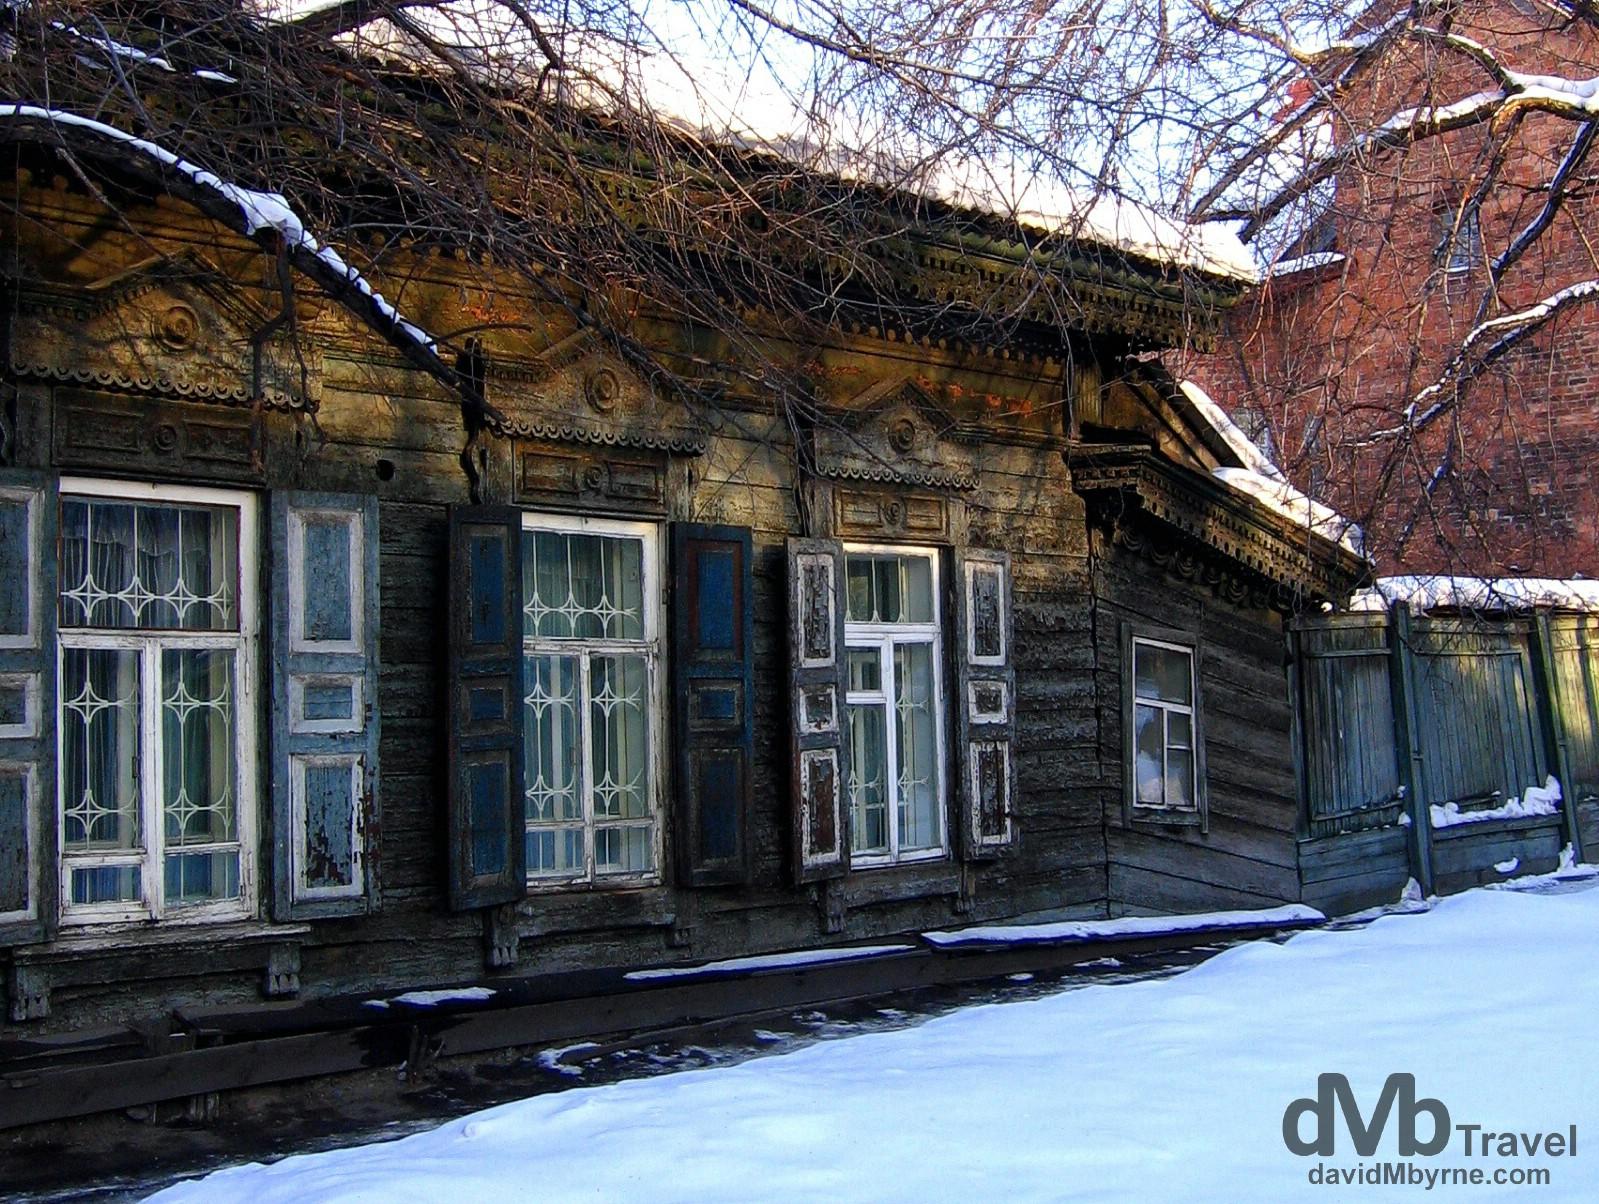 Irkutsk, Siberian Russia (2006)